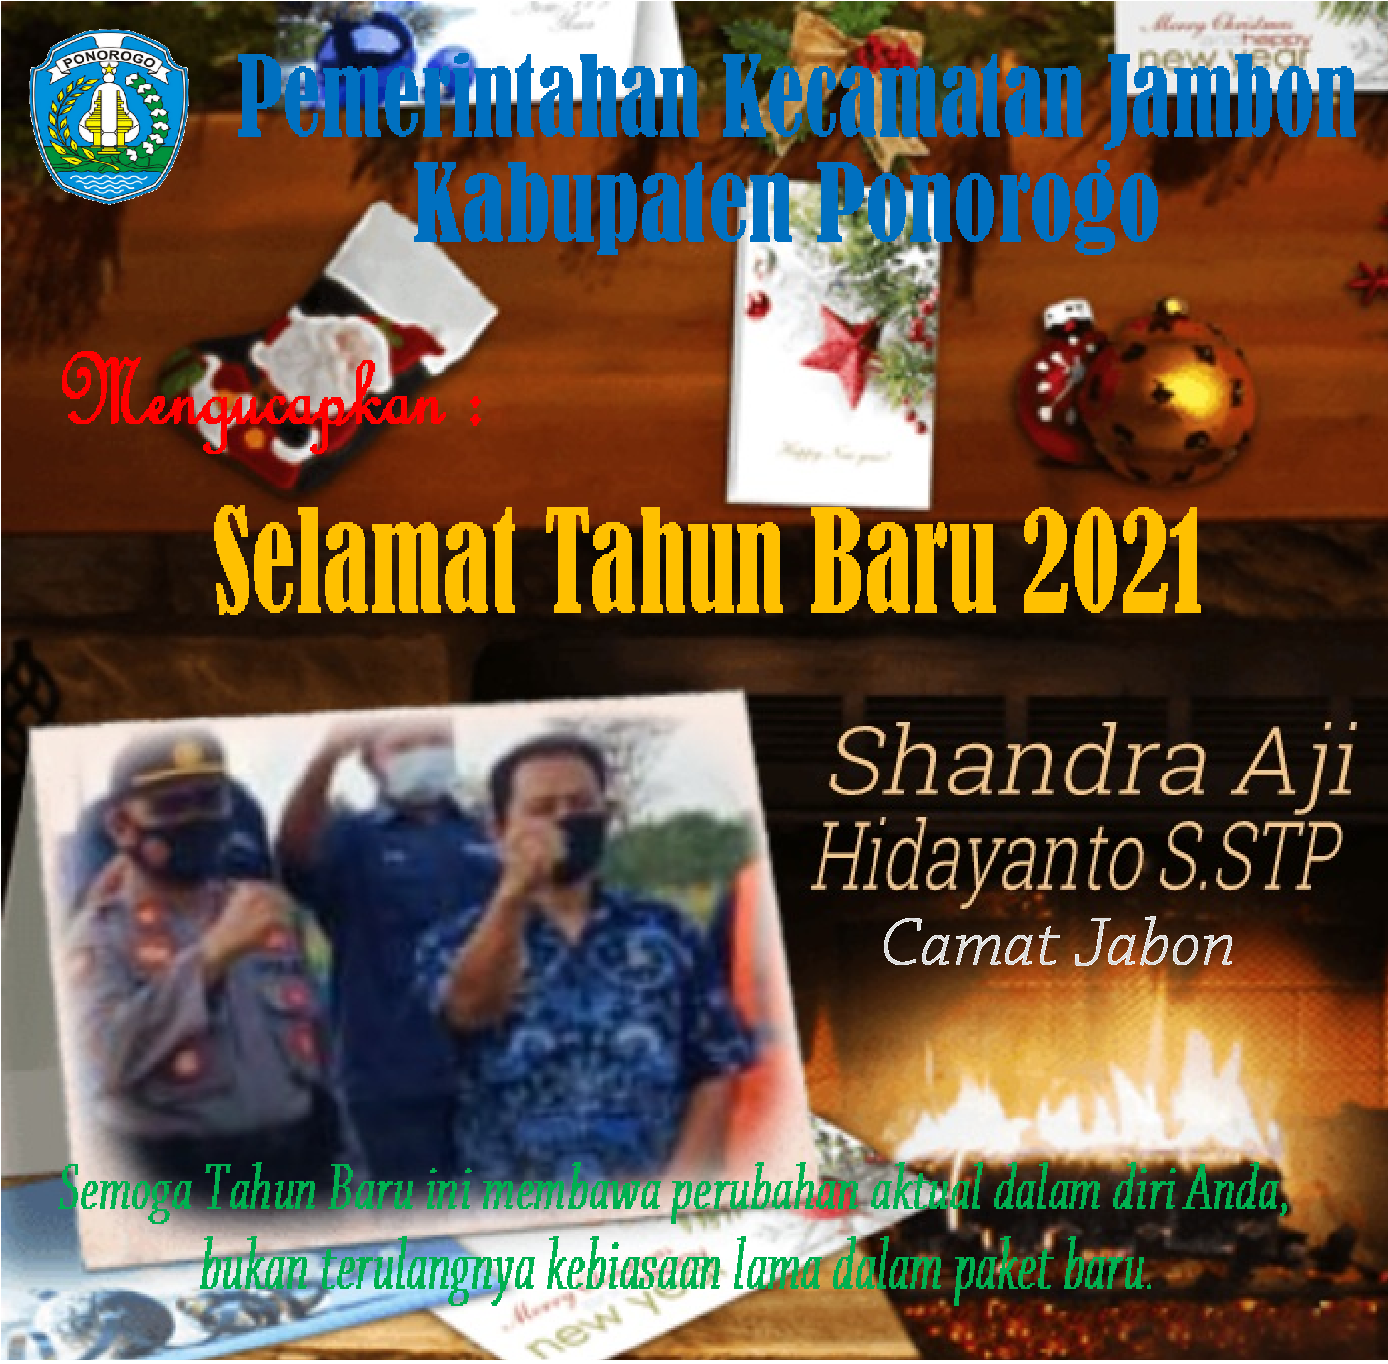 Pemerintahan Kecamatan Jambon  Kabupaten Ponorogo Mengucapkan : Selamat Tahun Baru 2021